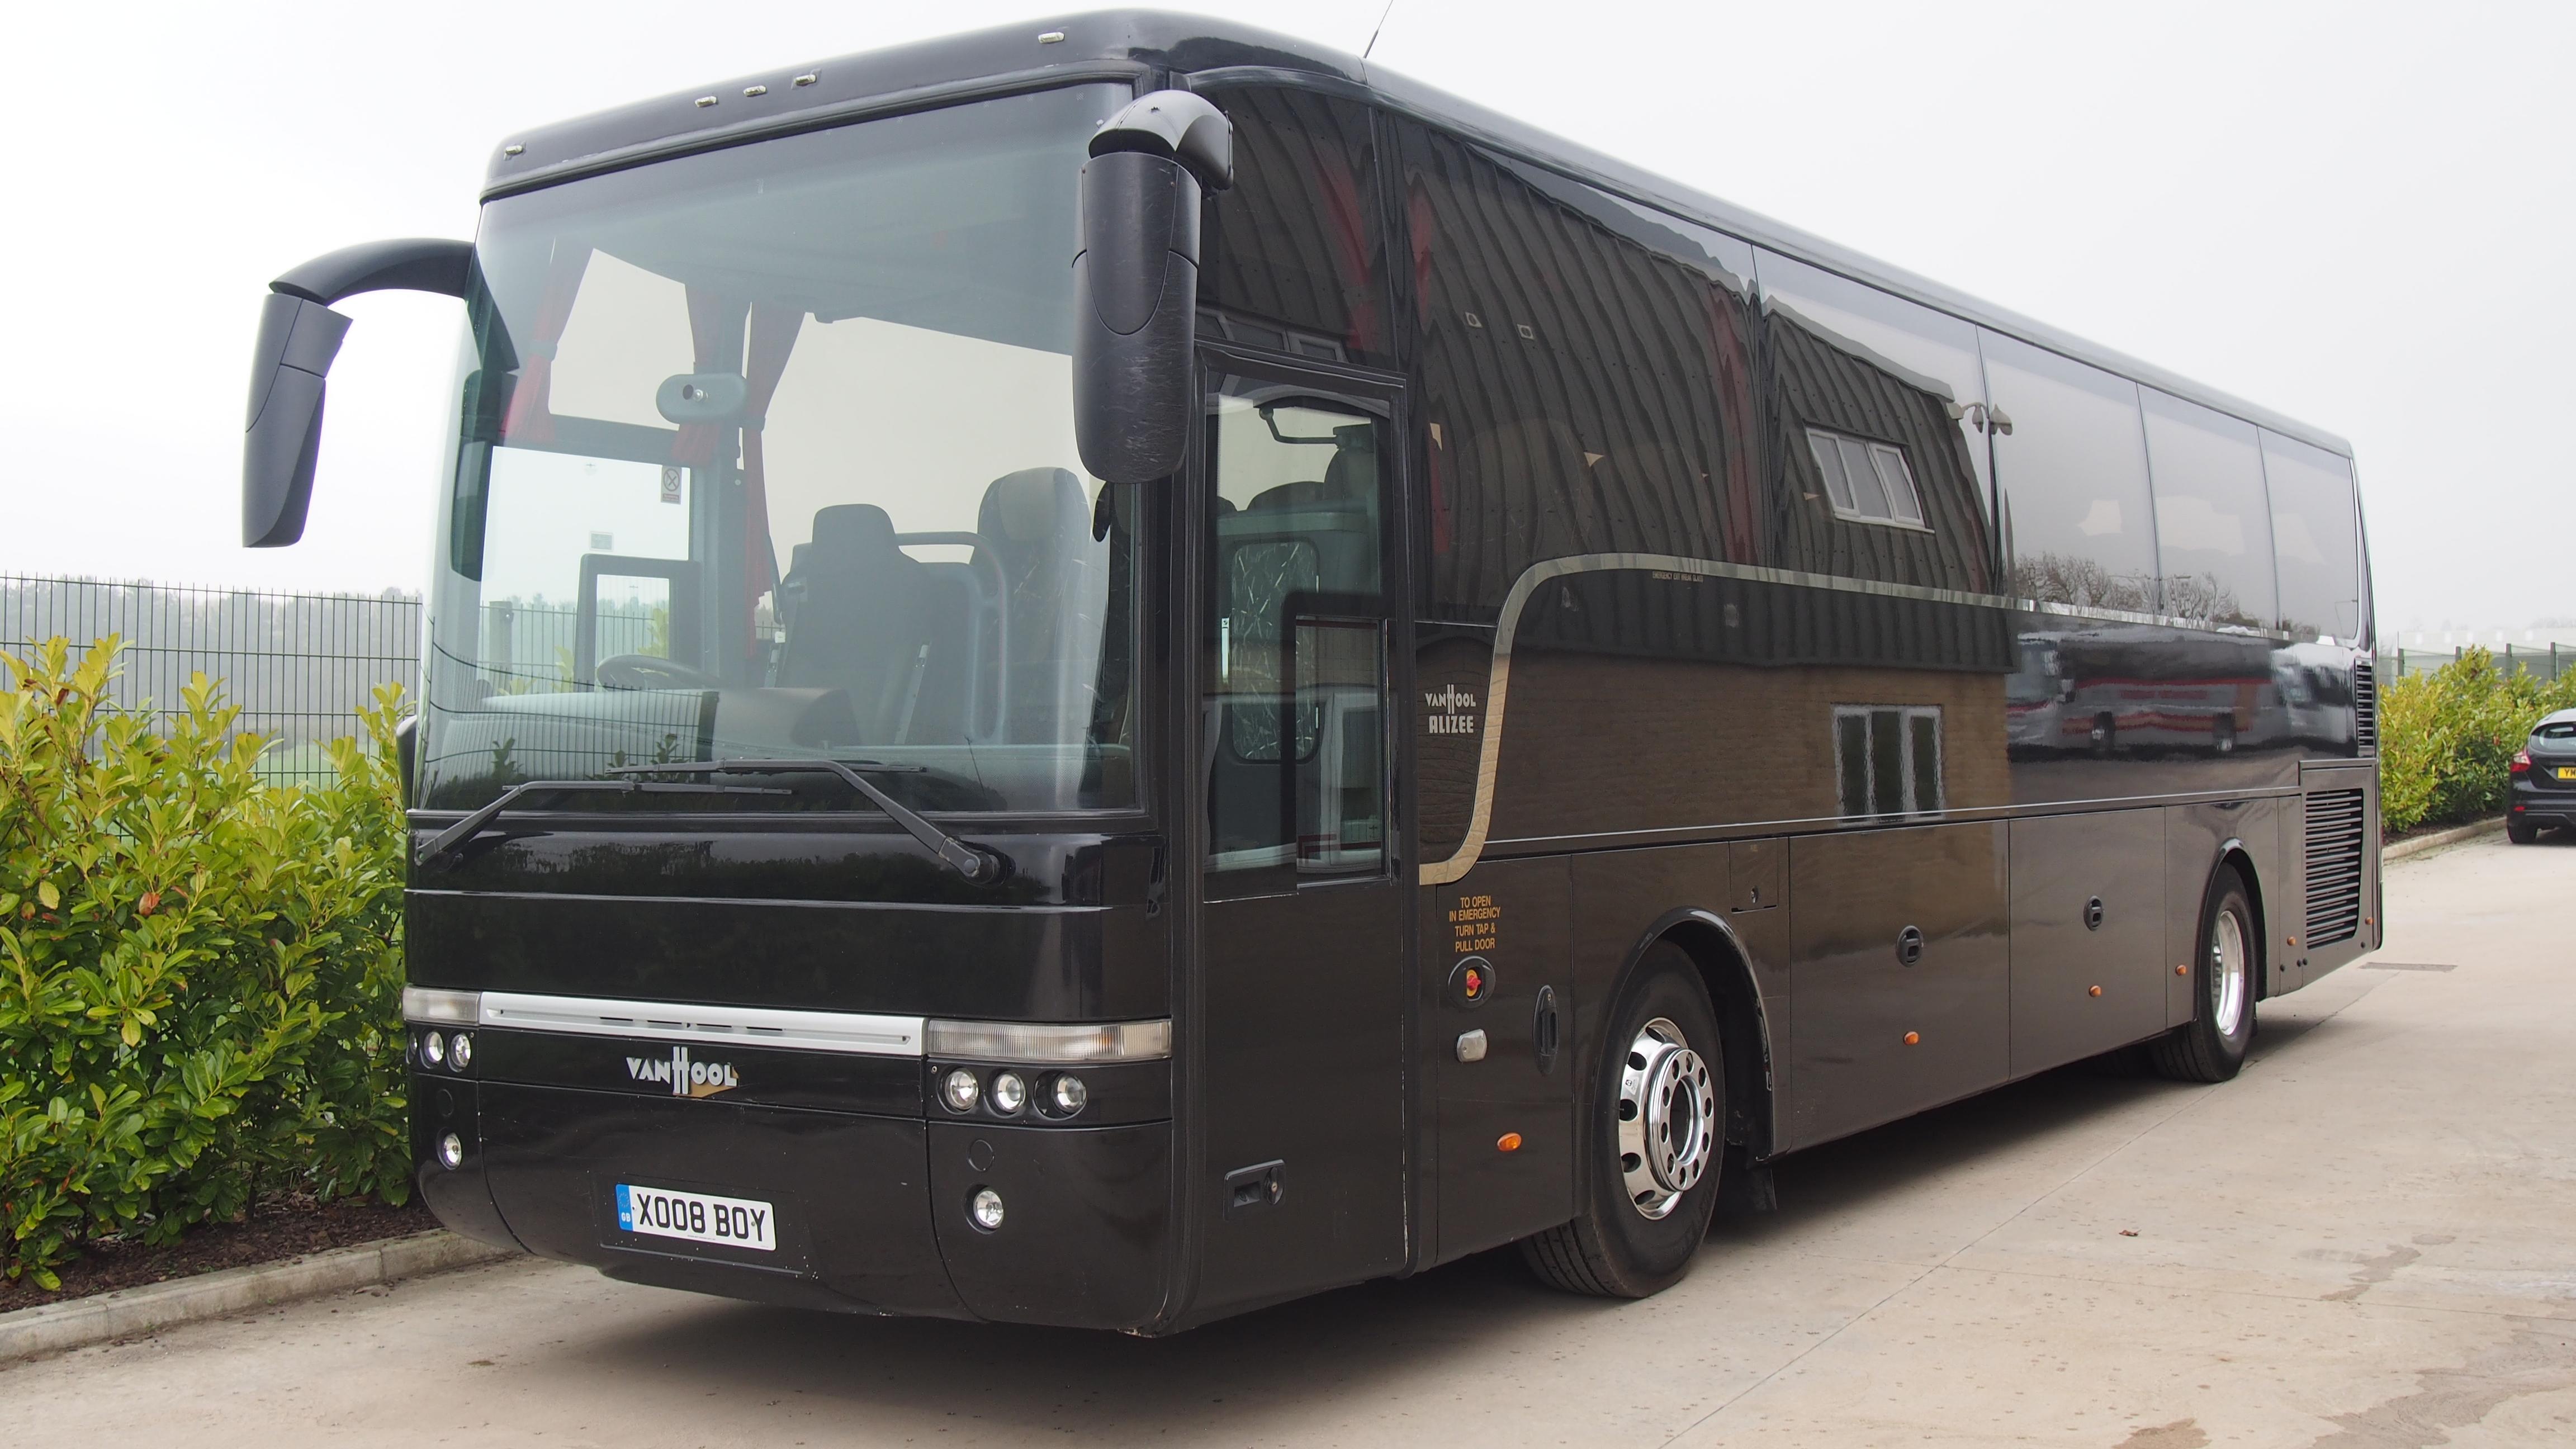 08 Volvo B12b Van Hool T9 53 Seats Hills Coaches